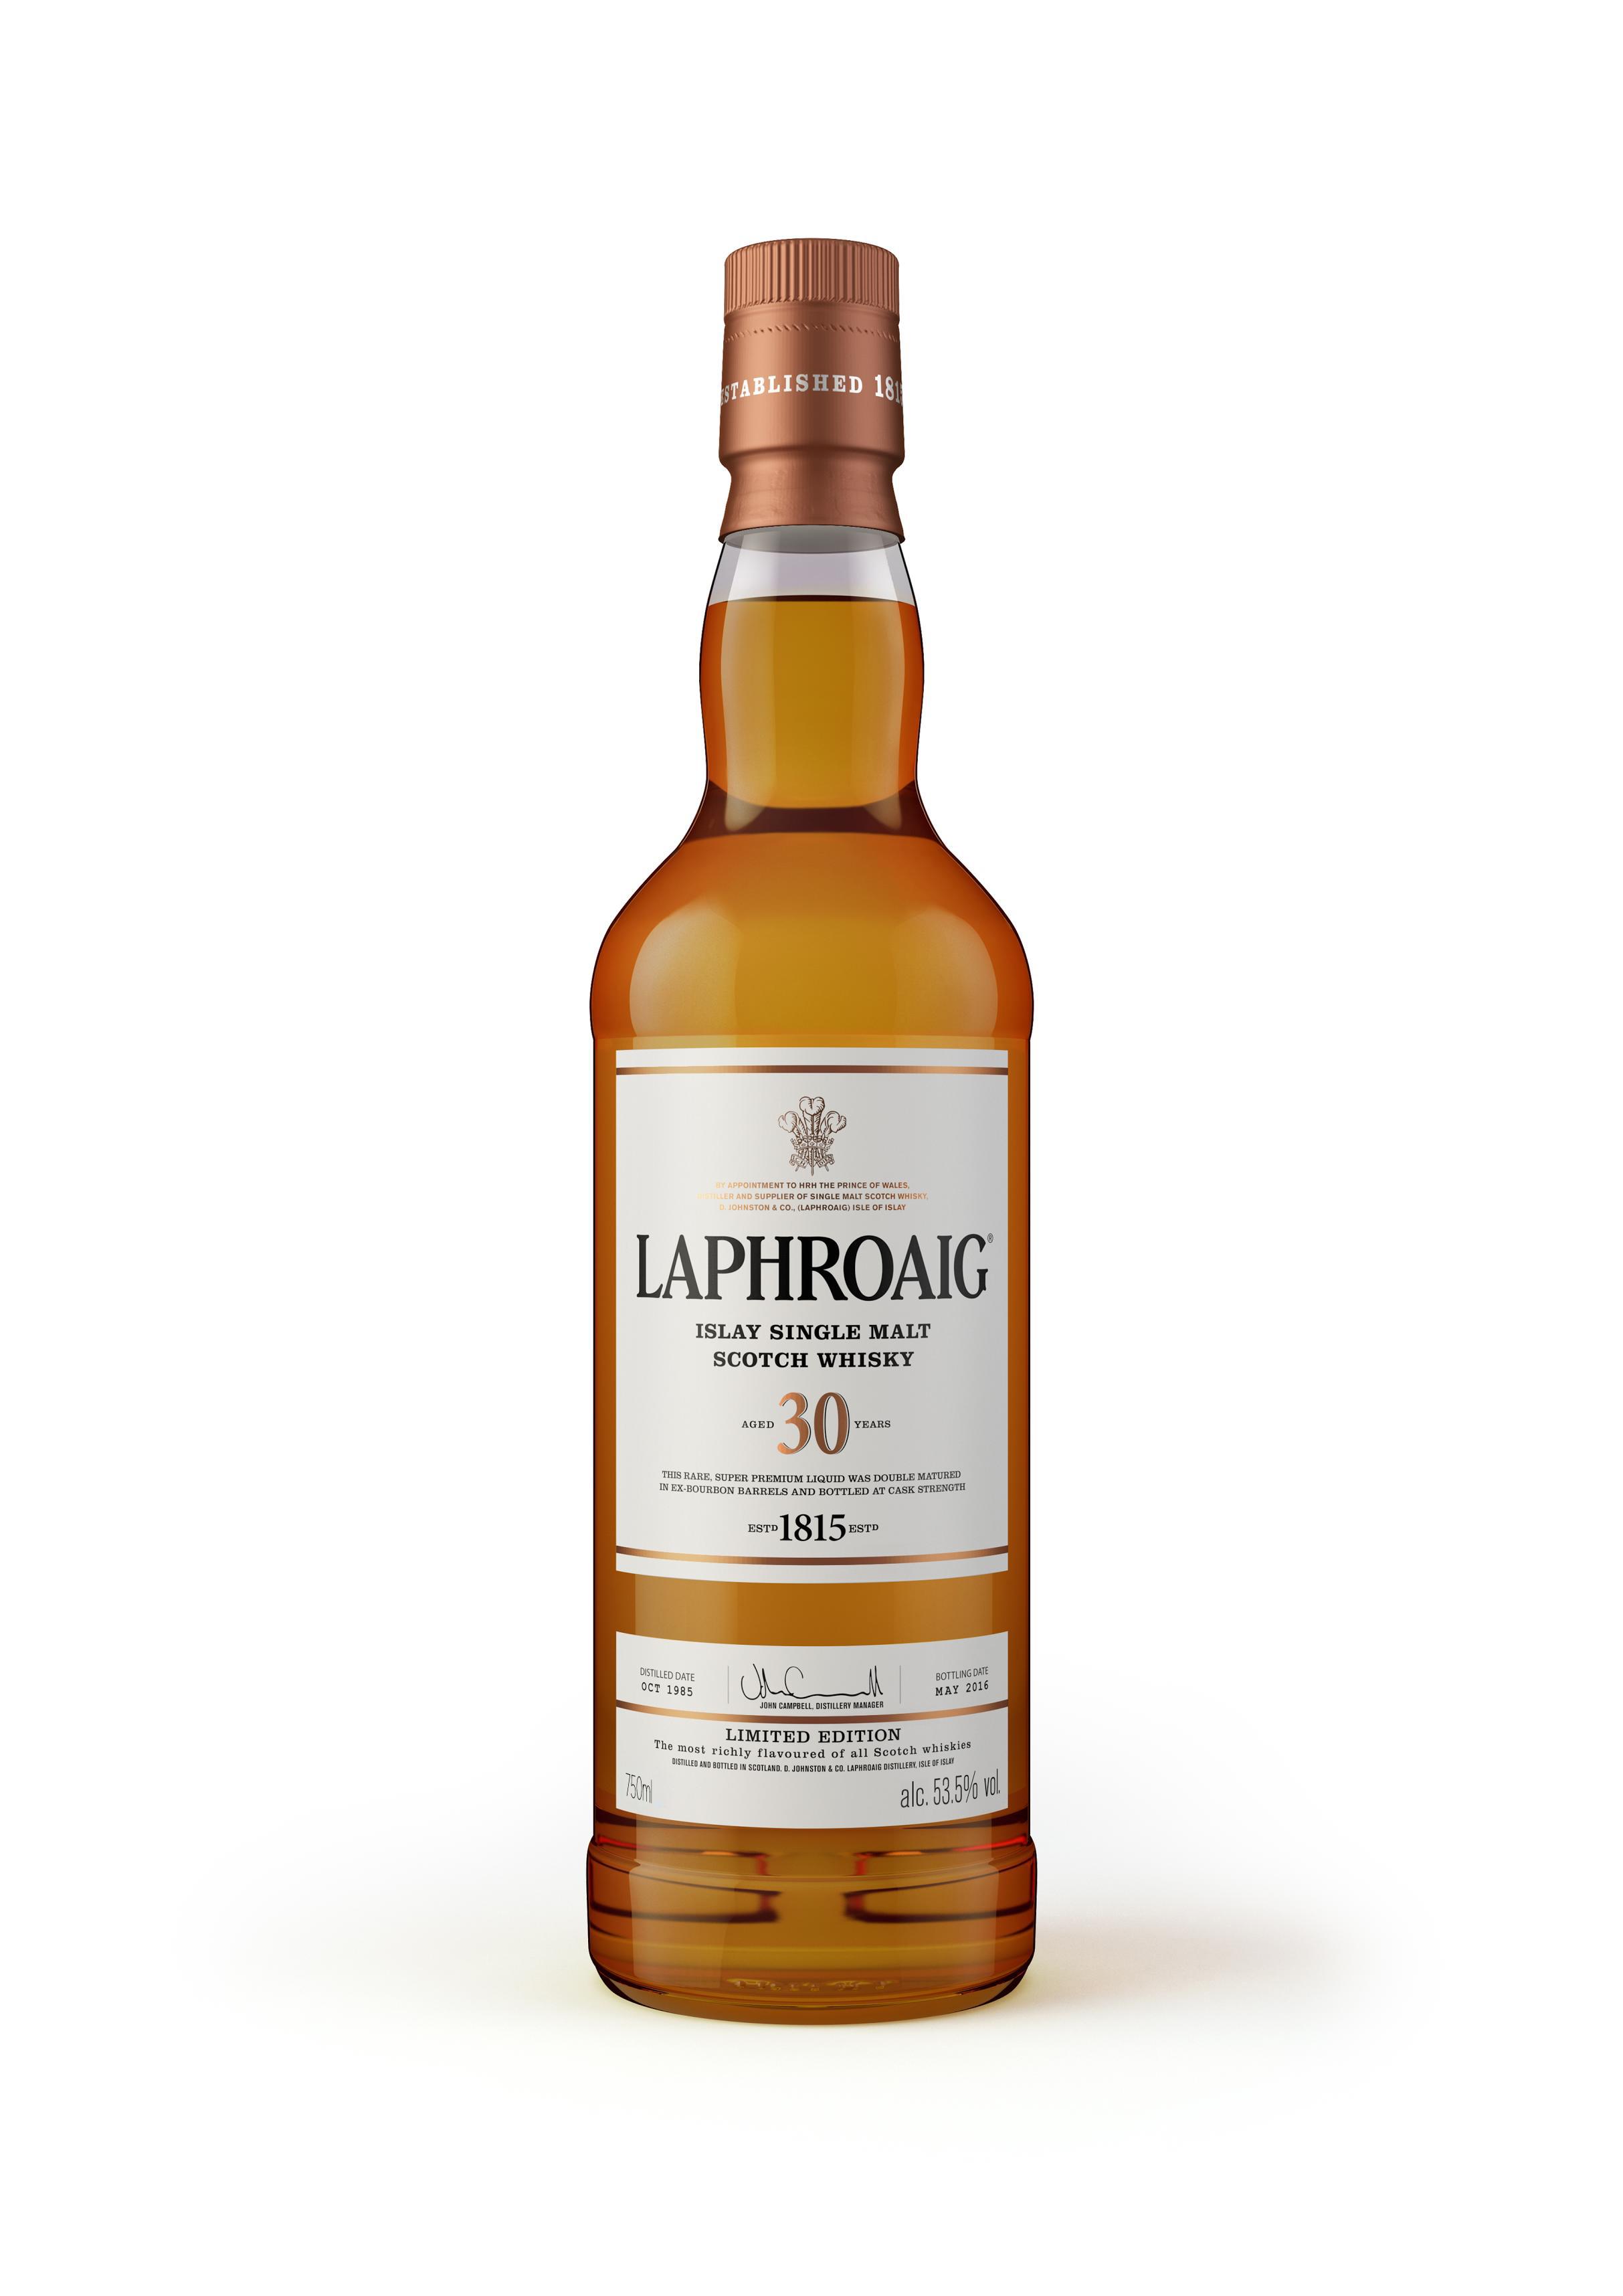 Laphroaig 30 Years Old